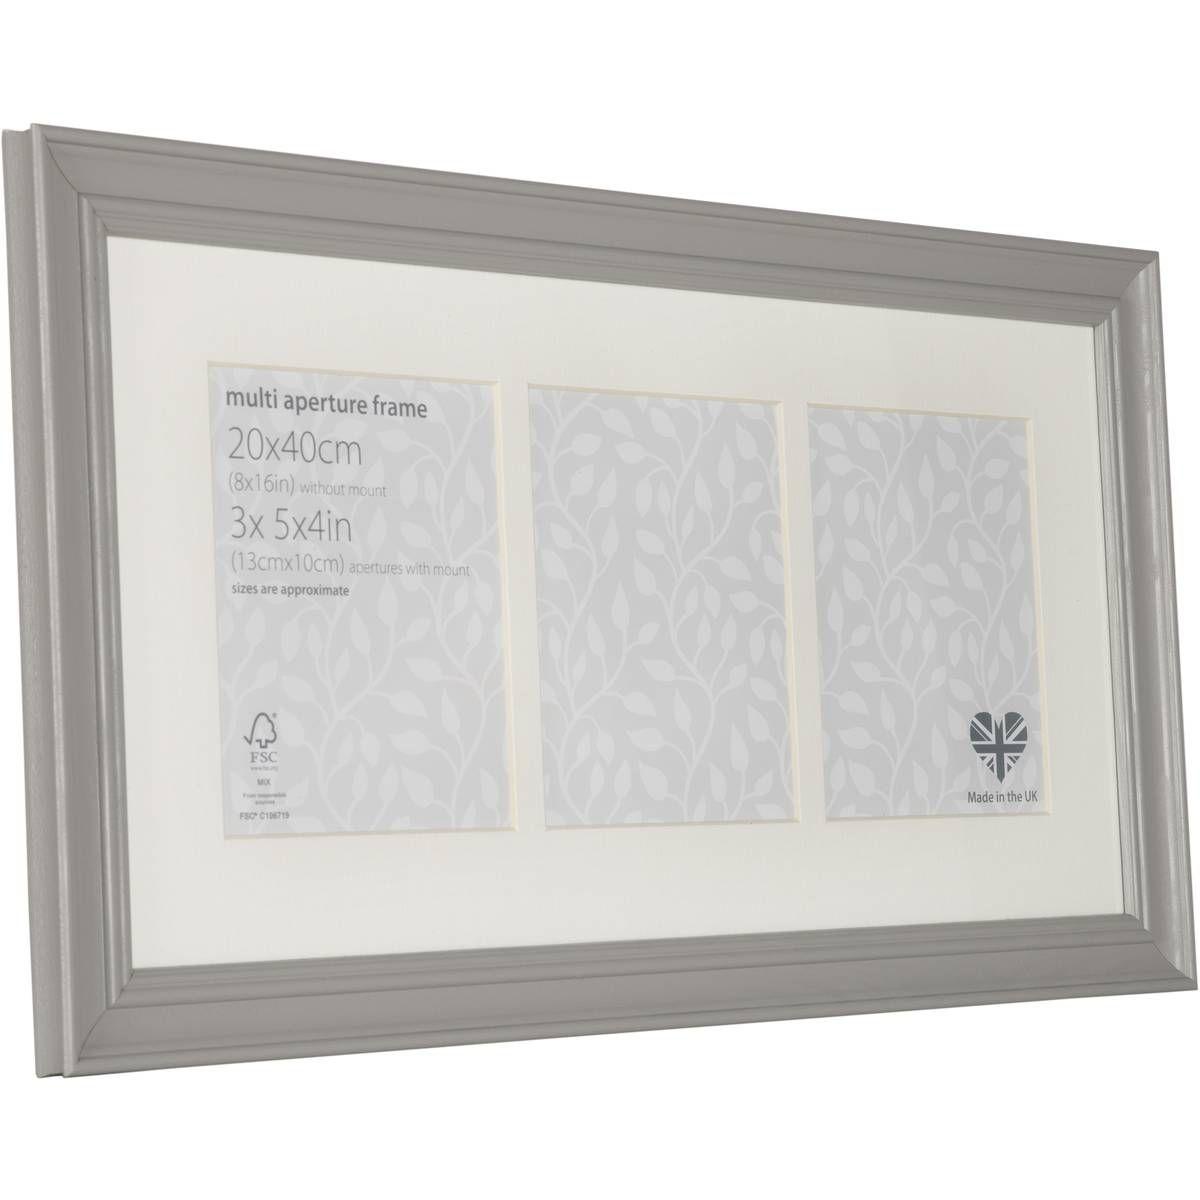 vintage grey frame multi aperture 20 x 40 centimetres - Multiple Photo Frame